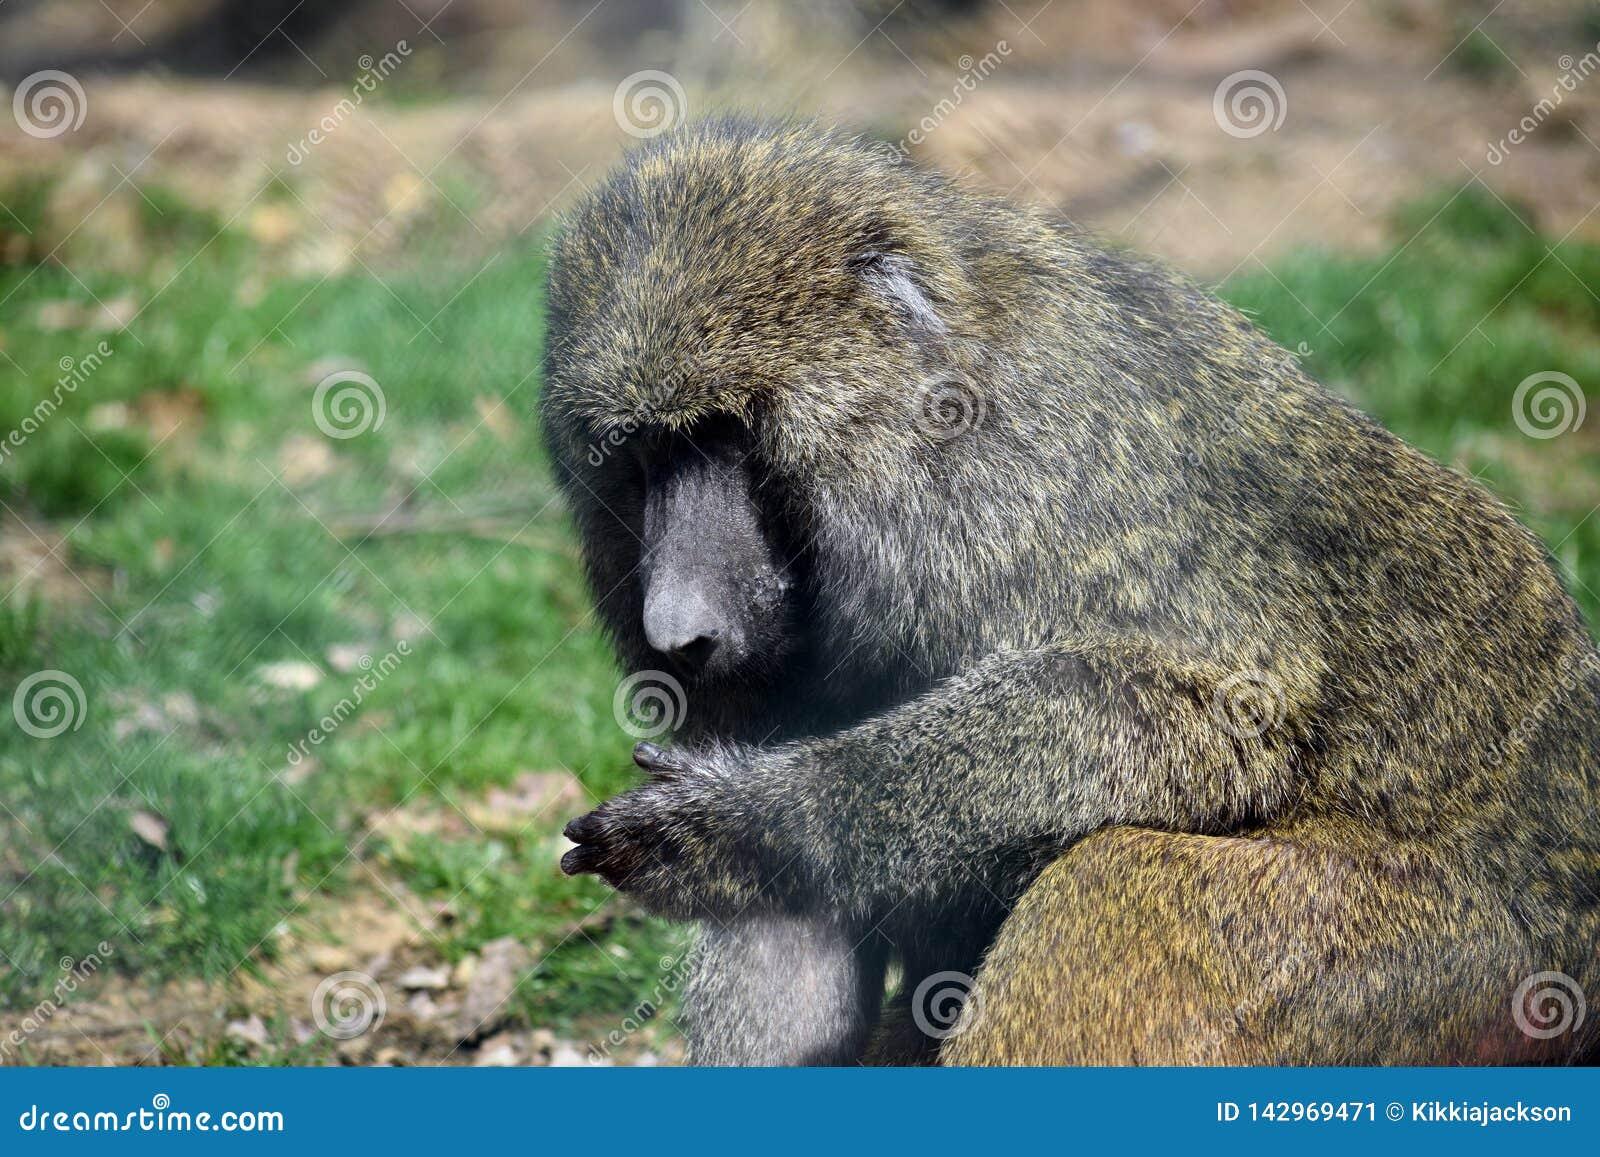 Baboon Monkey Papio Anubis Head Closeup Portrait Sitting